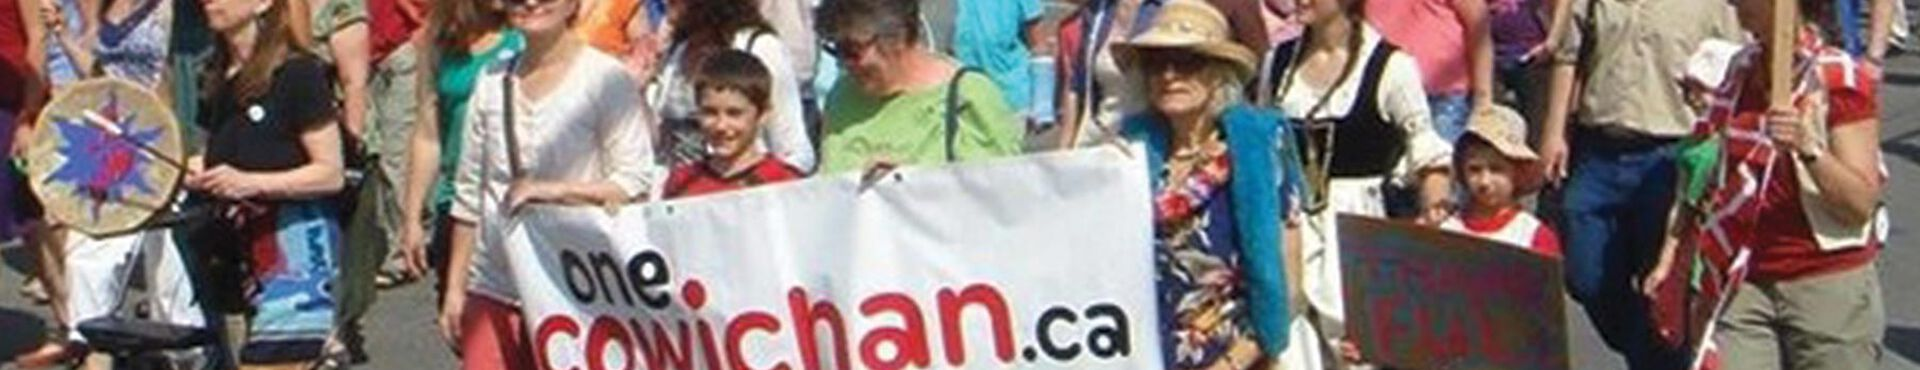 Banner - One Cowichan